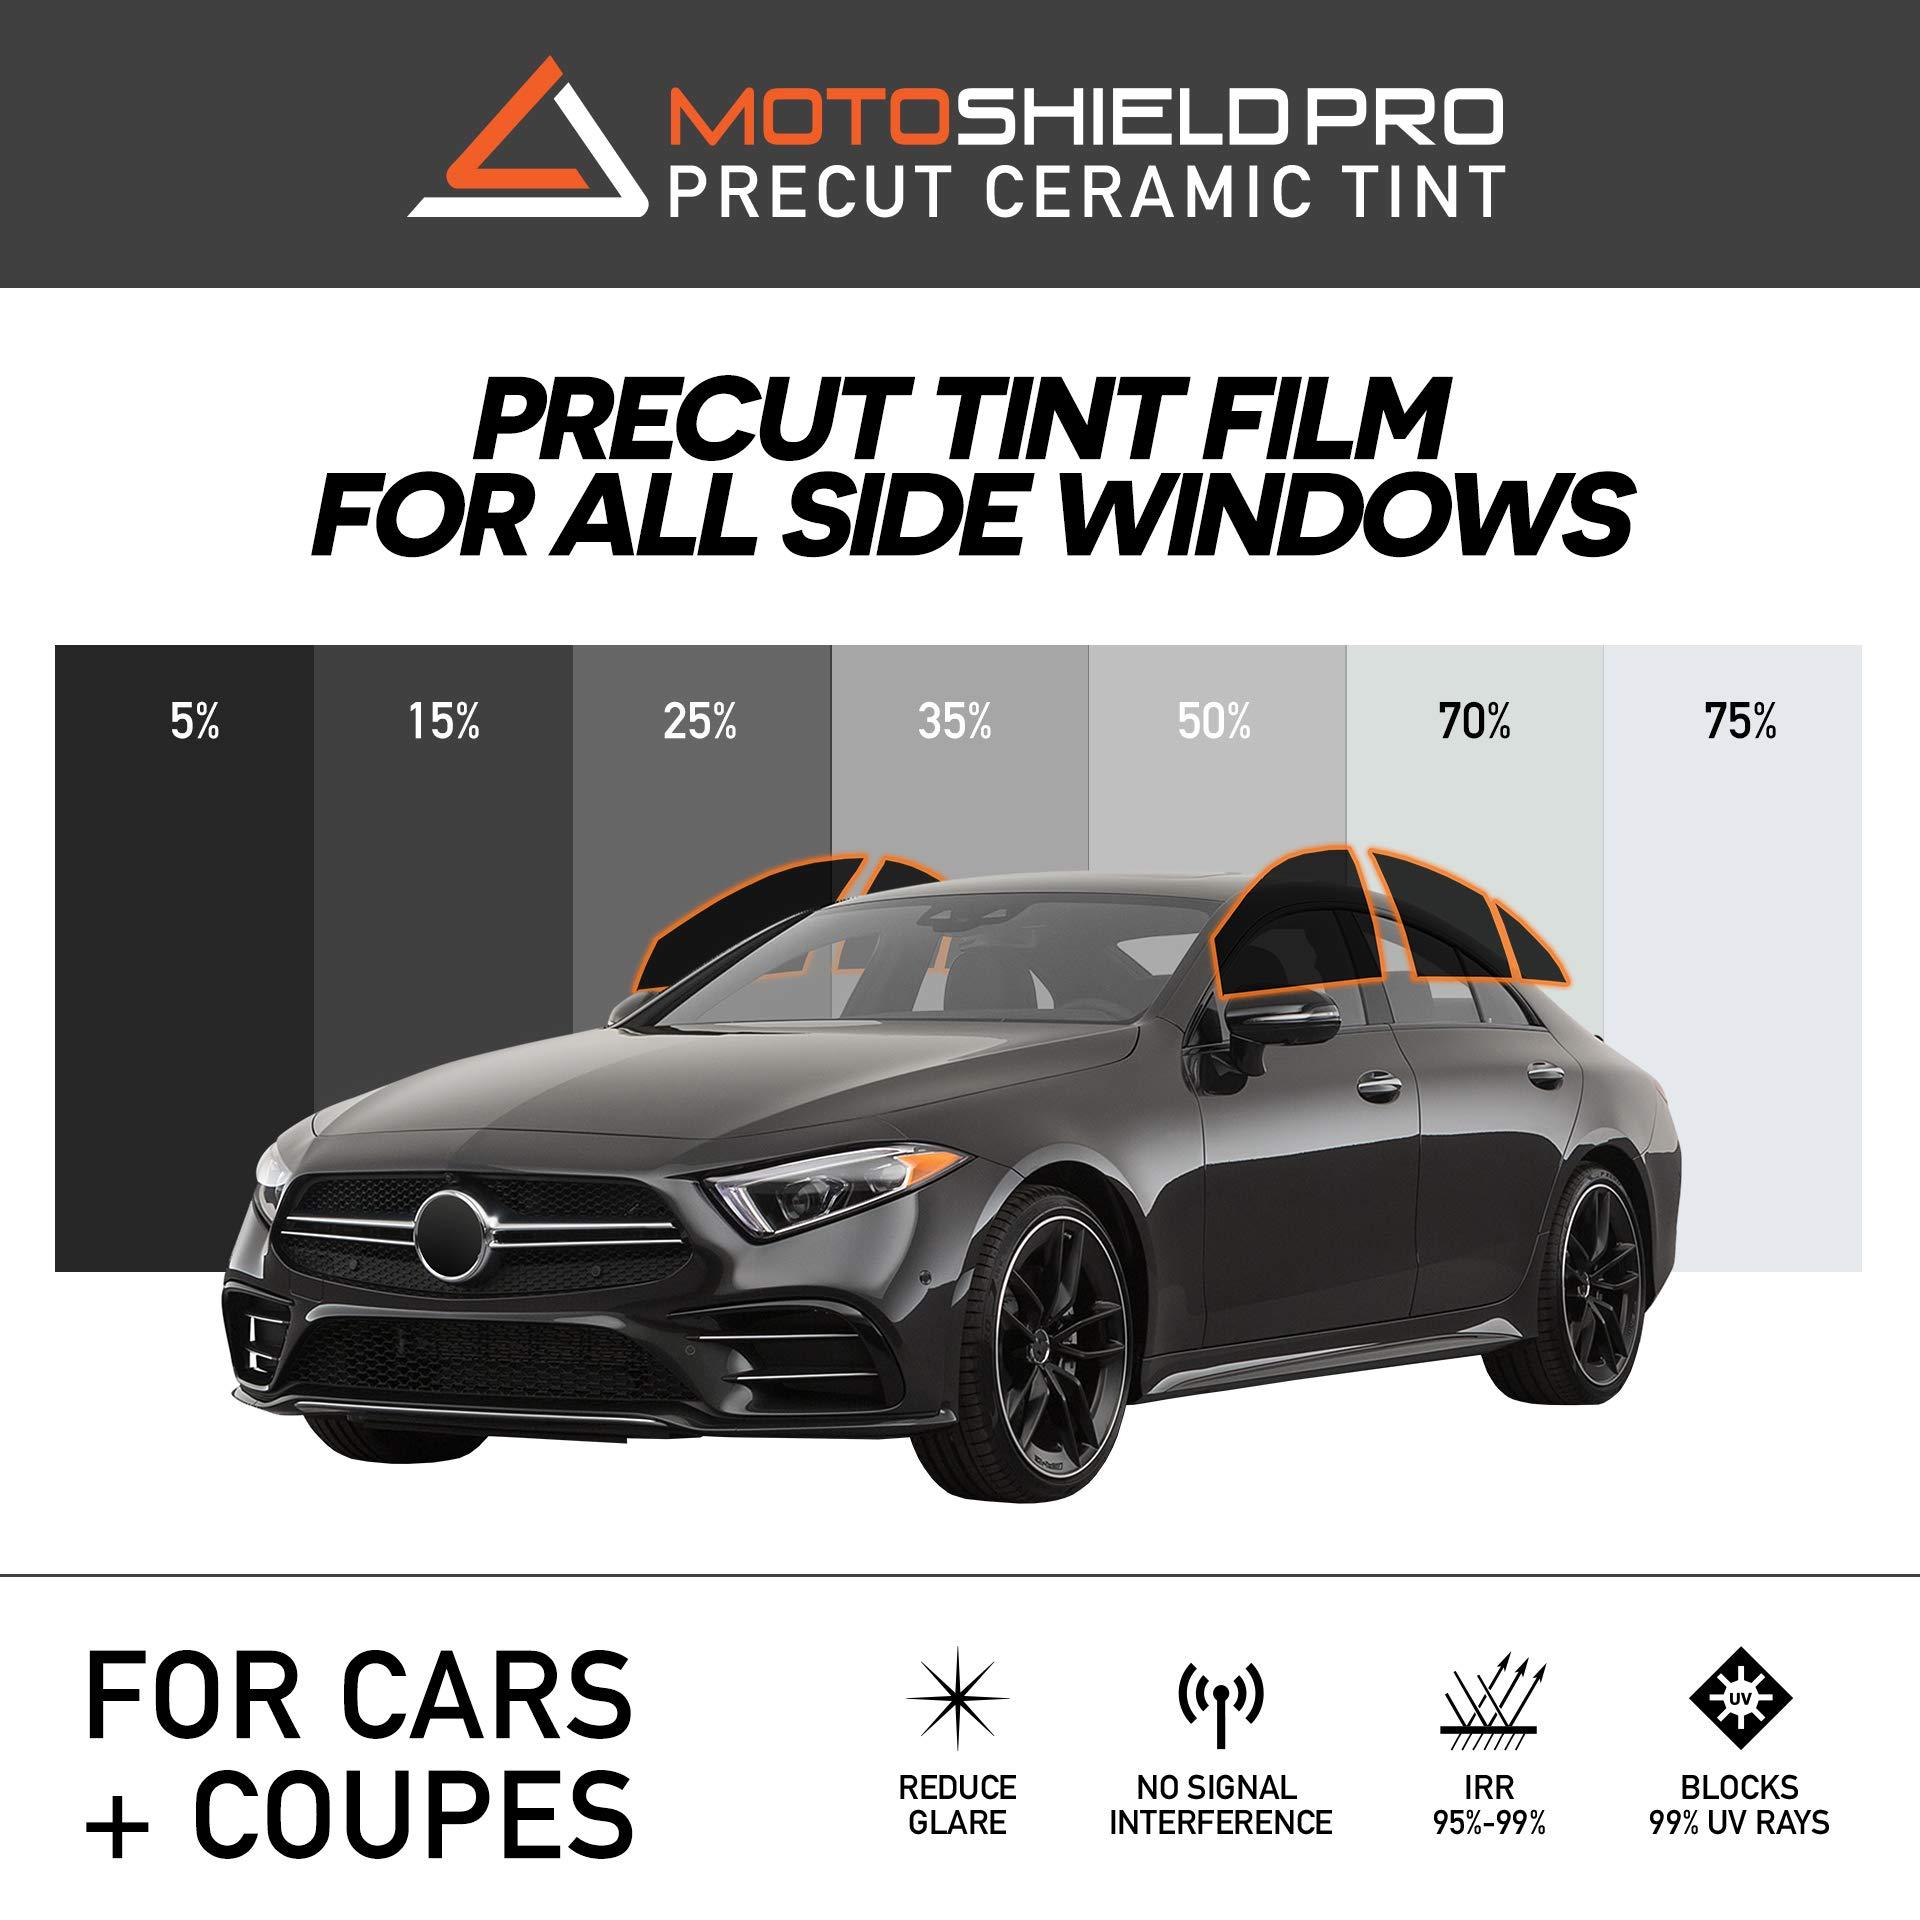 MotoShield Pro Precut Ceramic Tint Film [Blocks Up to 99% of UV/IRR Rays] Window Tint for Cars, Coupes - All Side Windows, Any Tint Shade by MotoShield Pro